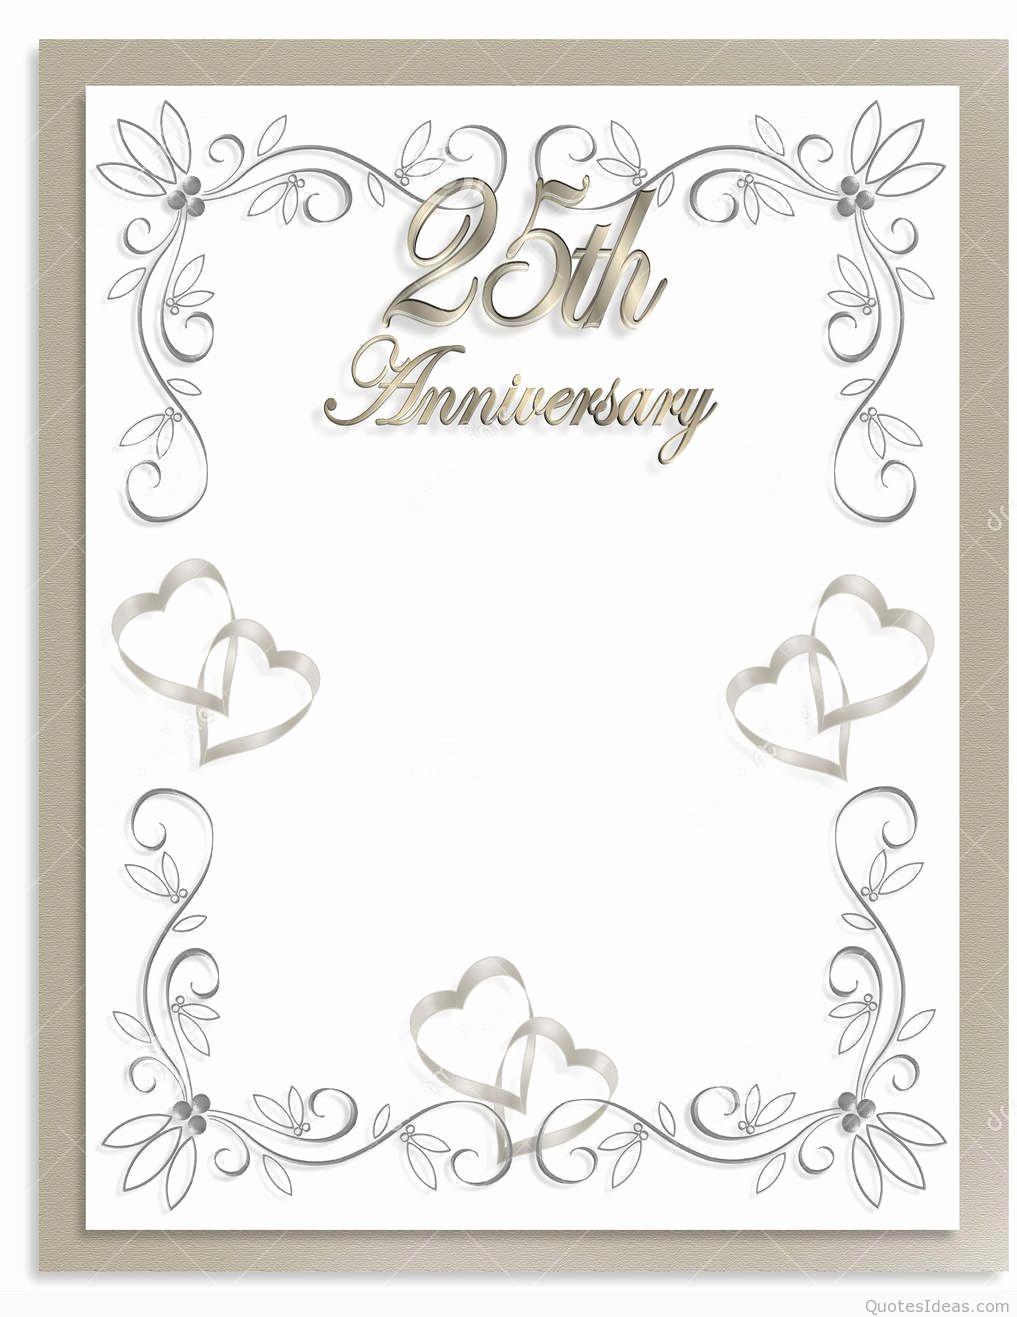 Wedding Anniversary Invitation Template Inspirational Free Silver Wedding Anniversary Invitations Templates